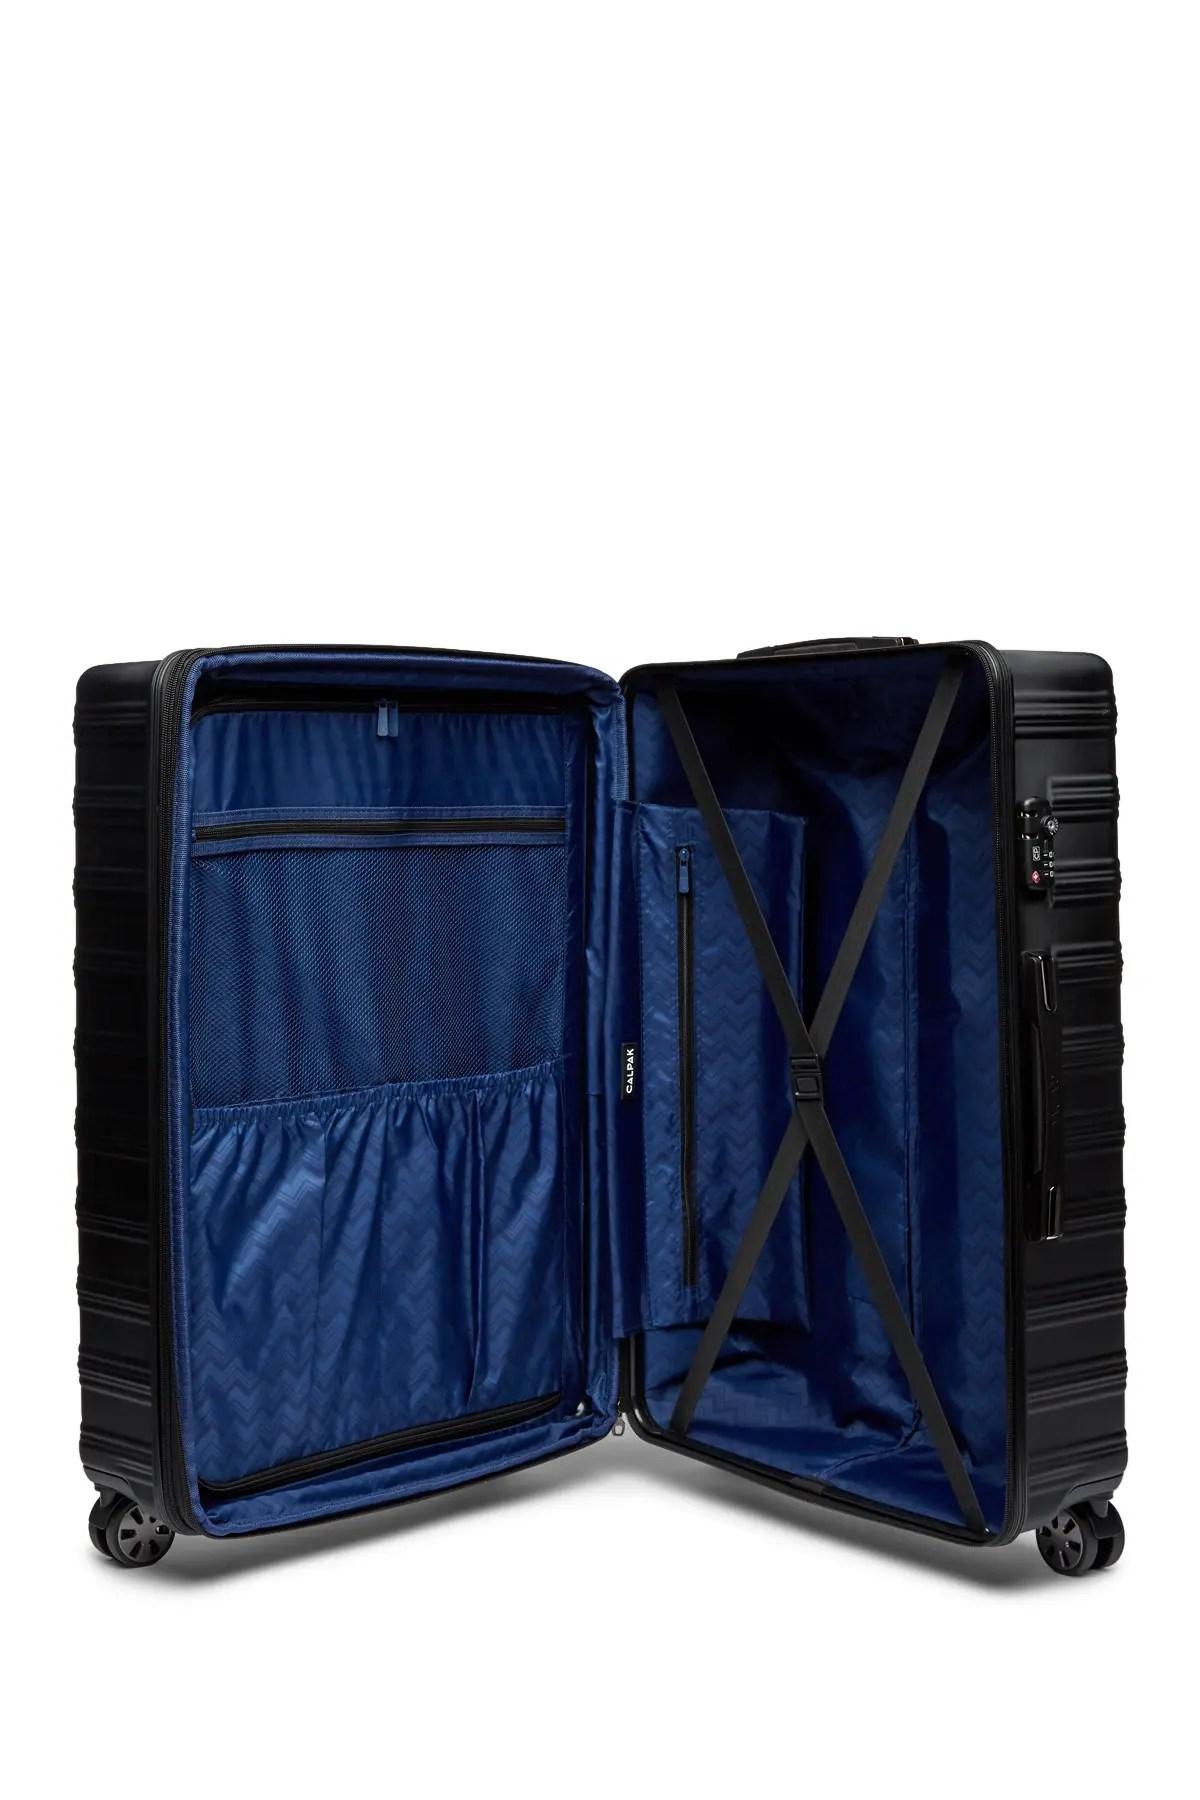 calpak luggage cyprus 2 piece spinner luggage set nordstrom rack